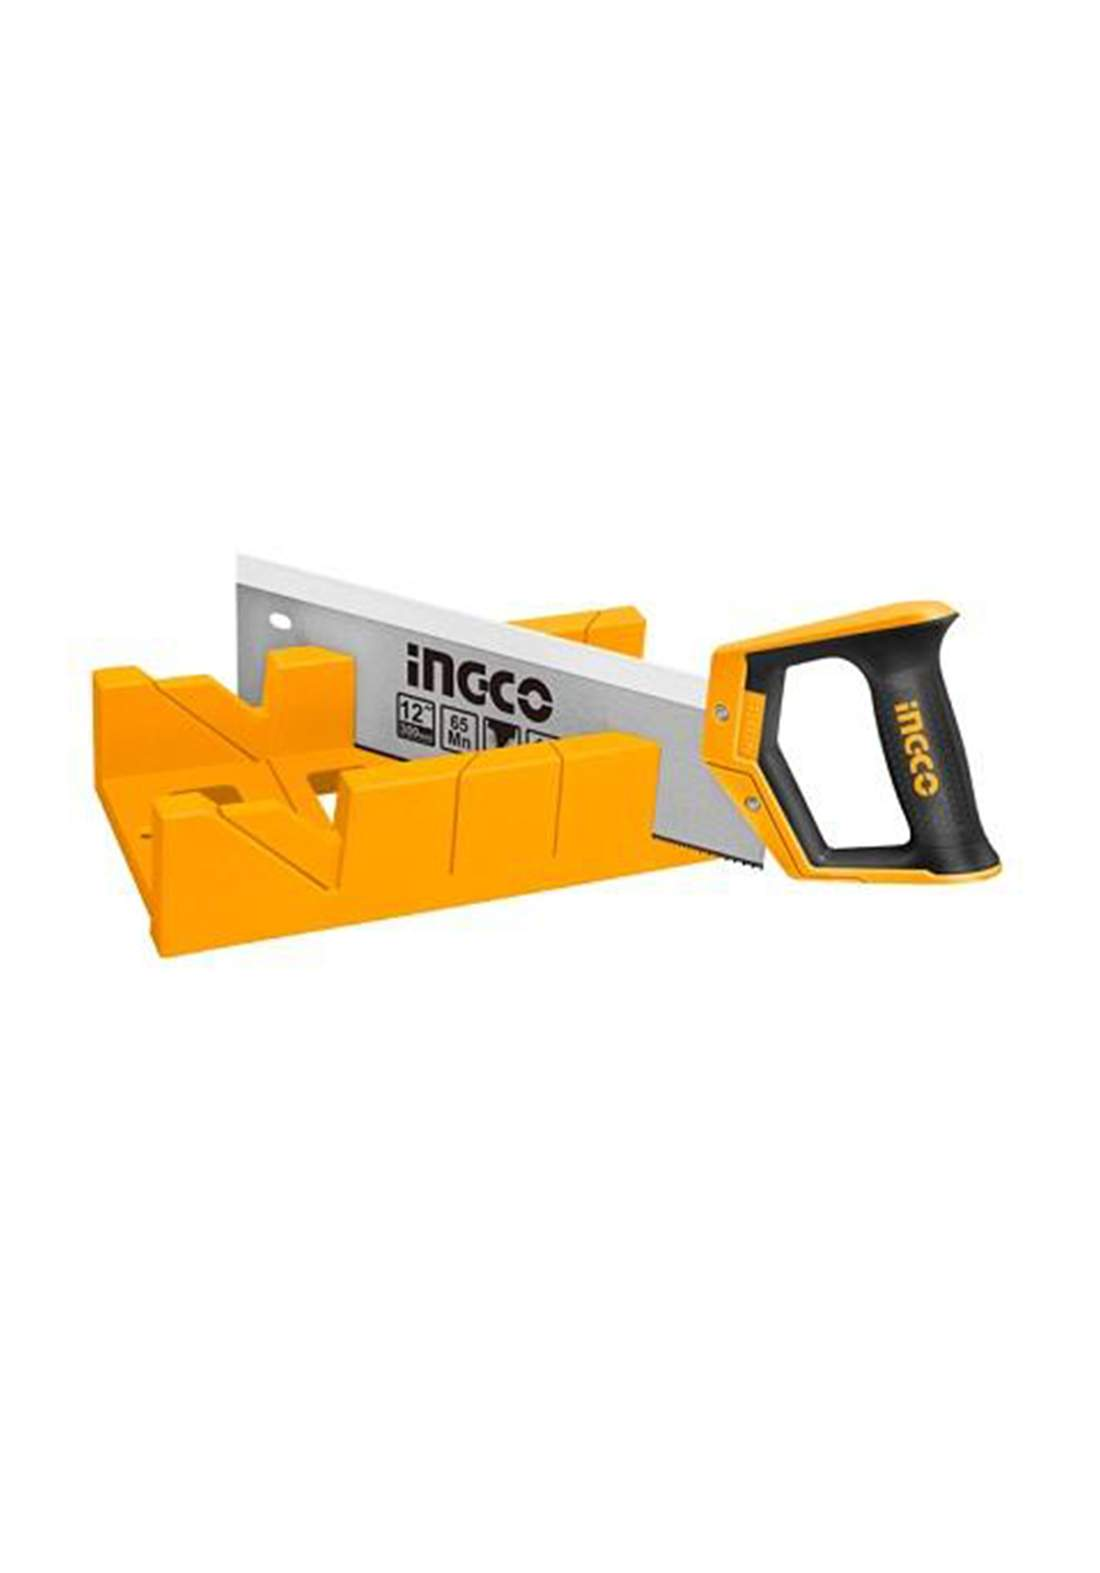 Ingco HMBS3008  Mitre Box and Back Saw Set منشار خشب قاعدة